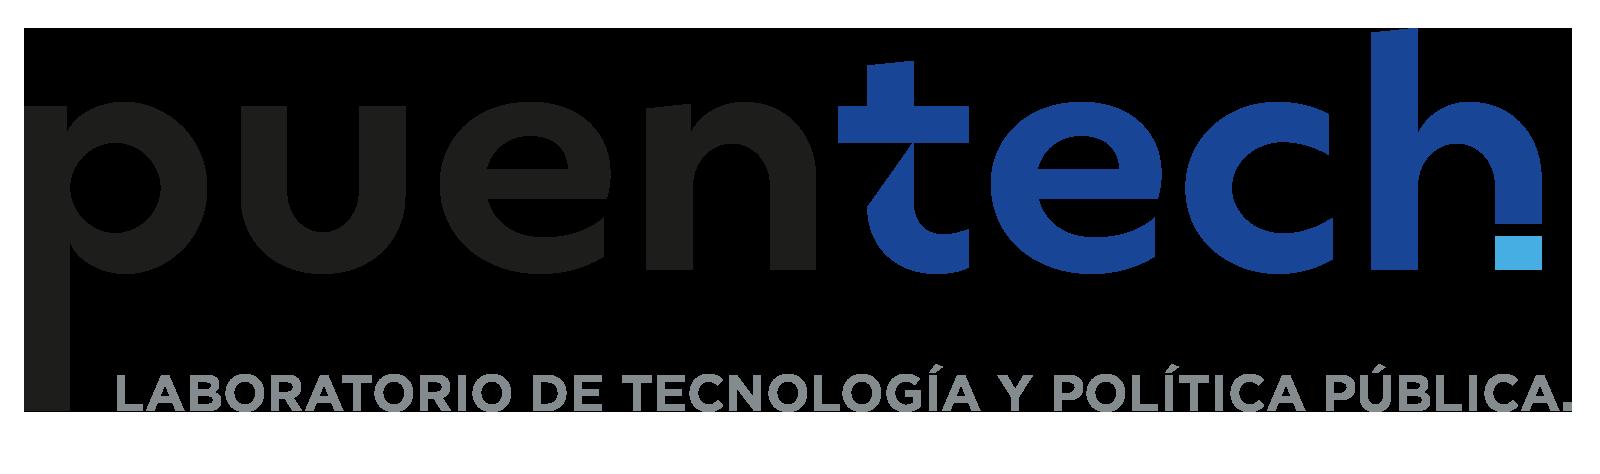 Puentech laboratorio (1)